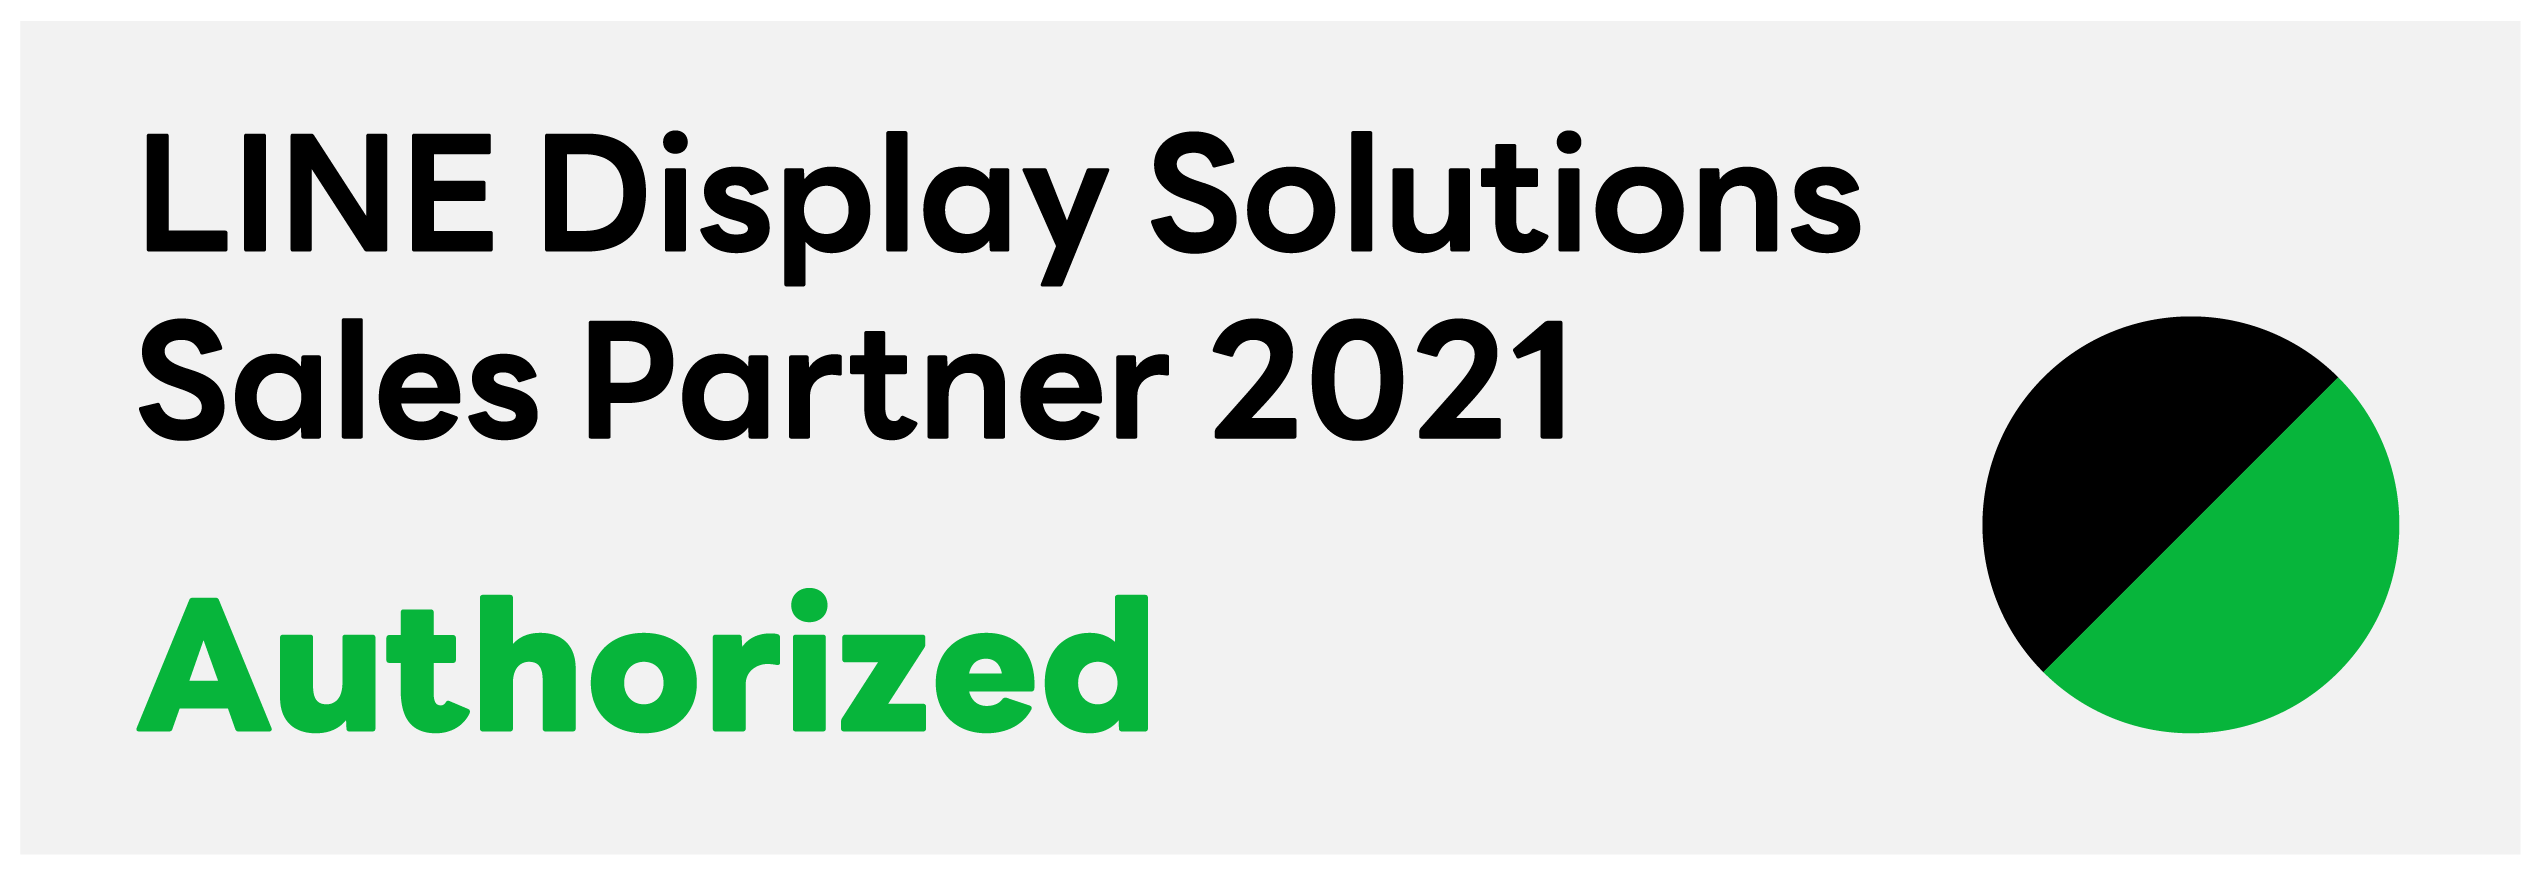 LINE Ads Platform Sales Partner 2021 Authorized